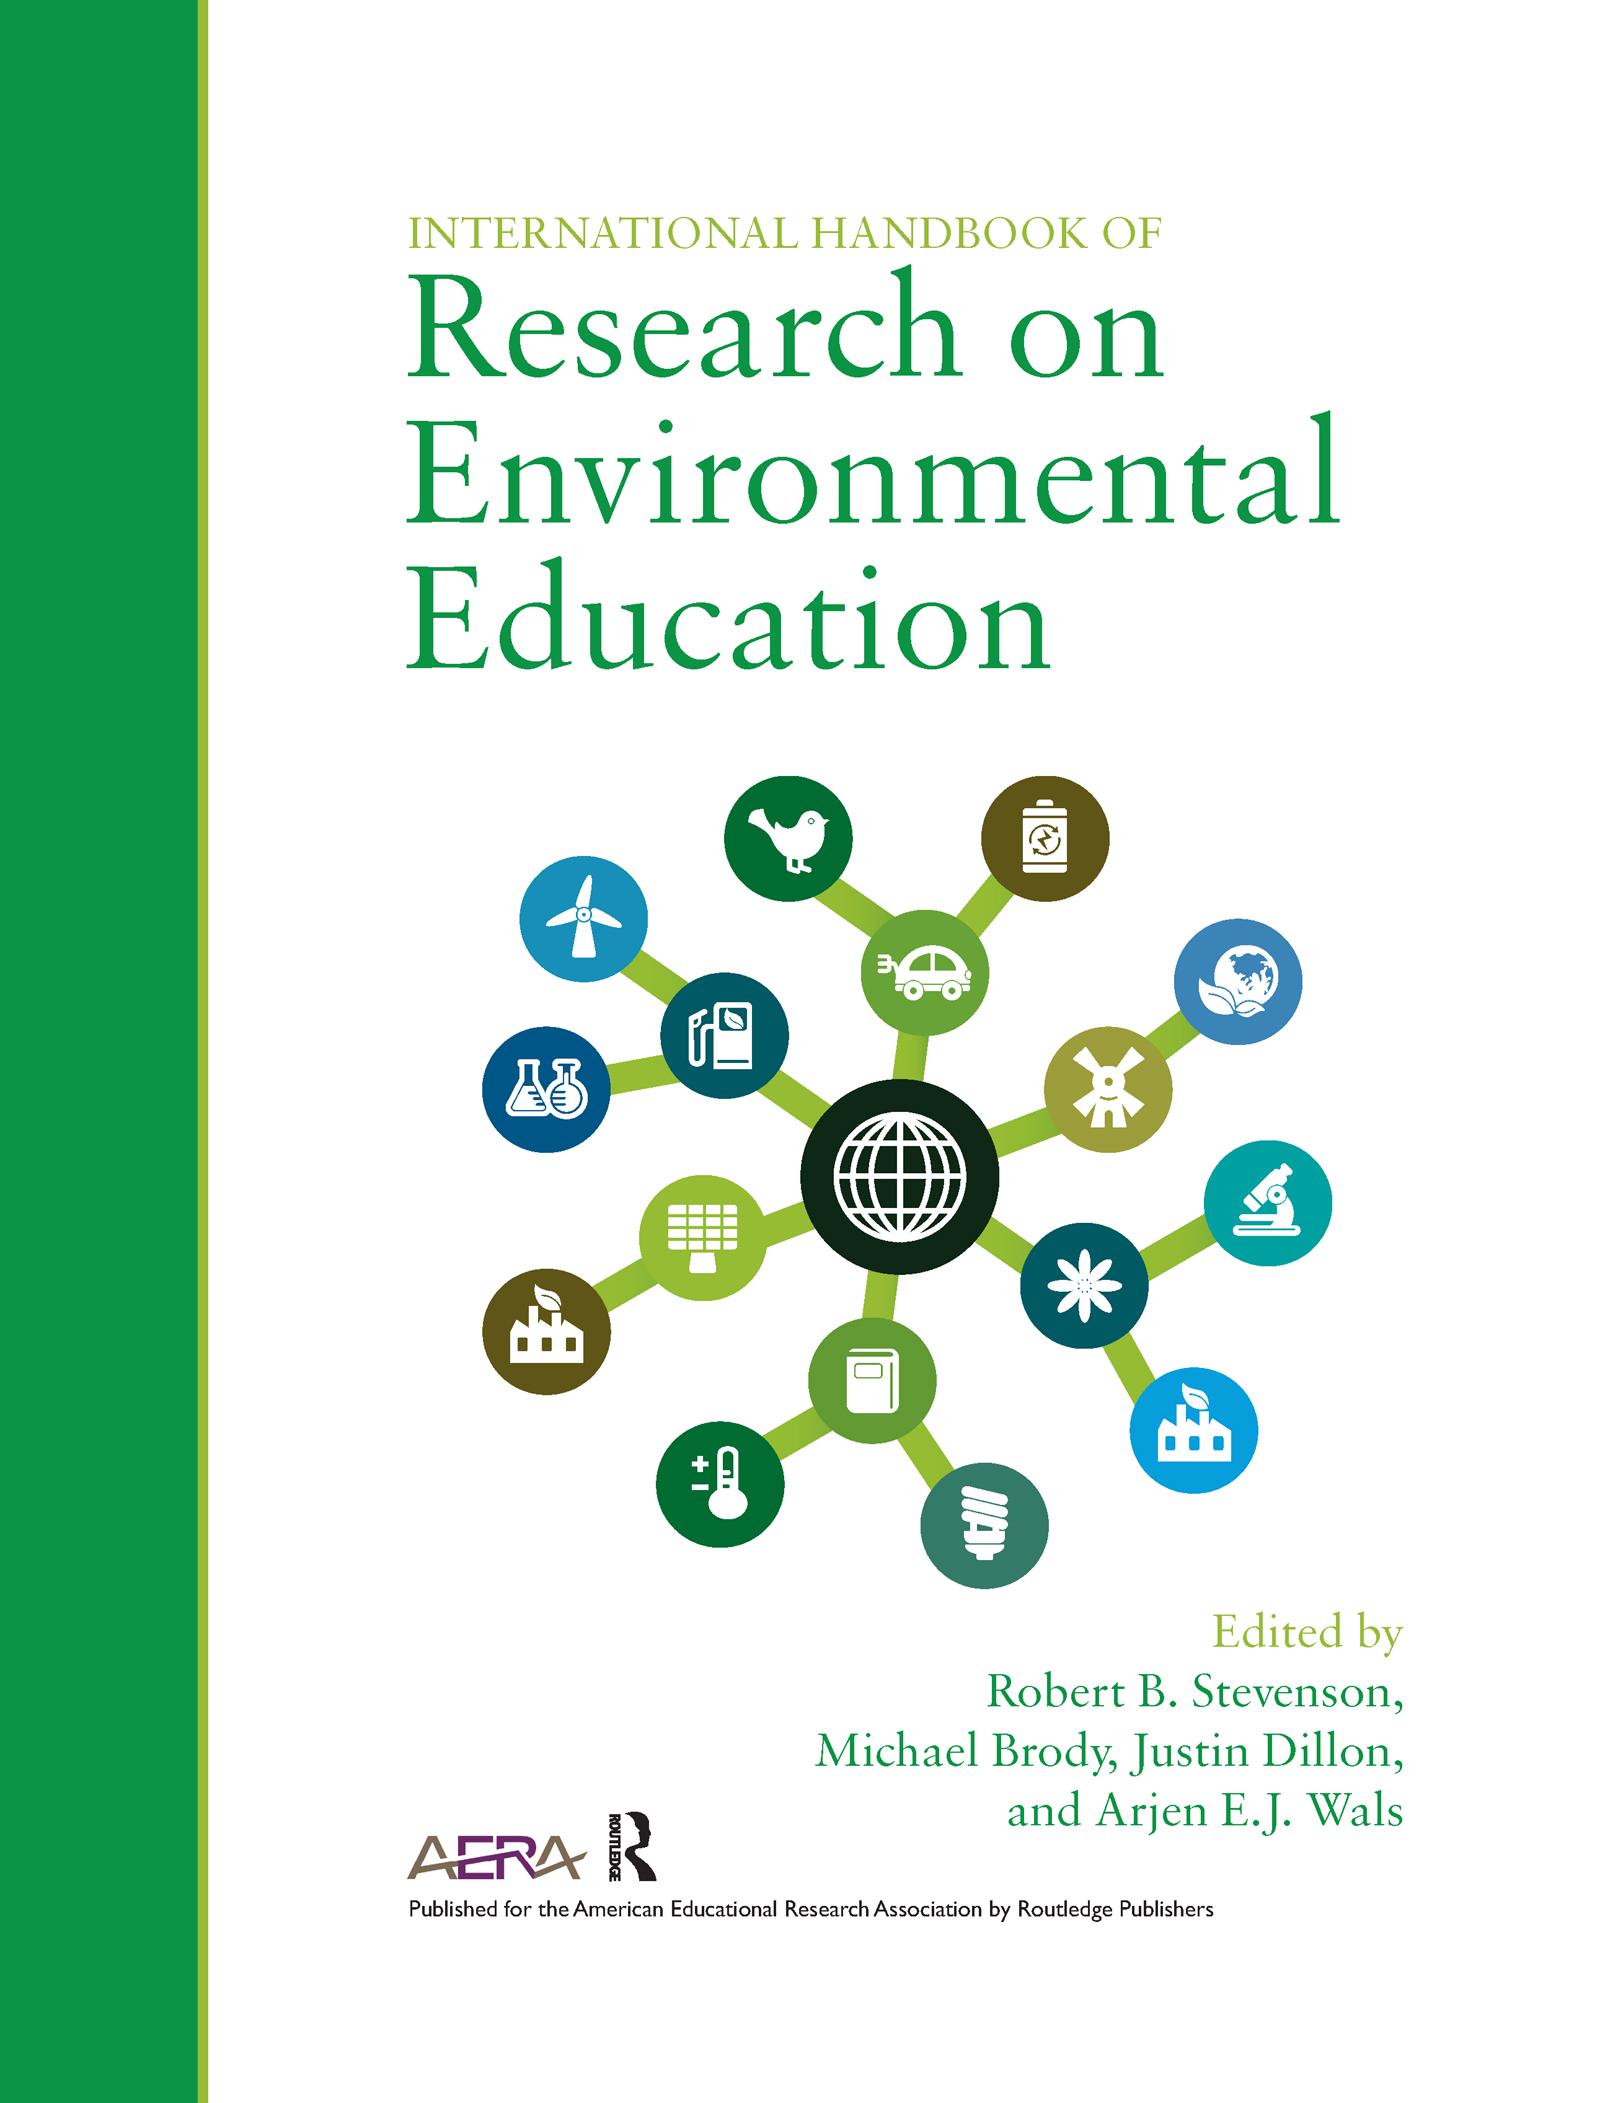 Nationalist perspective does homework improve academic achievement counterparts